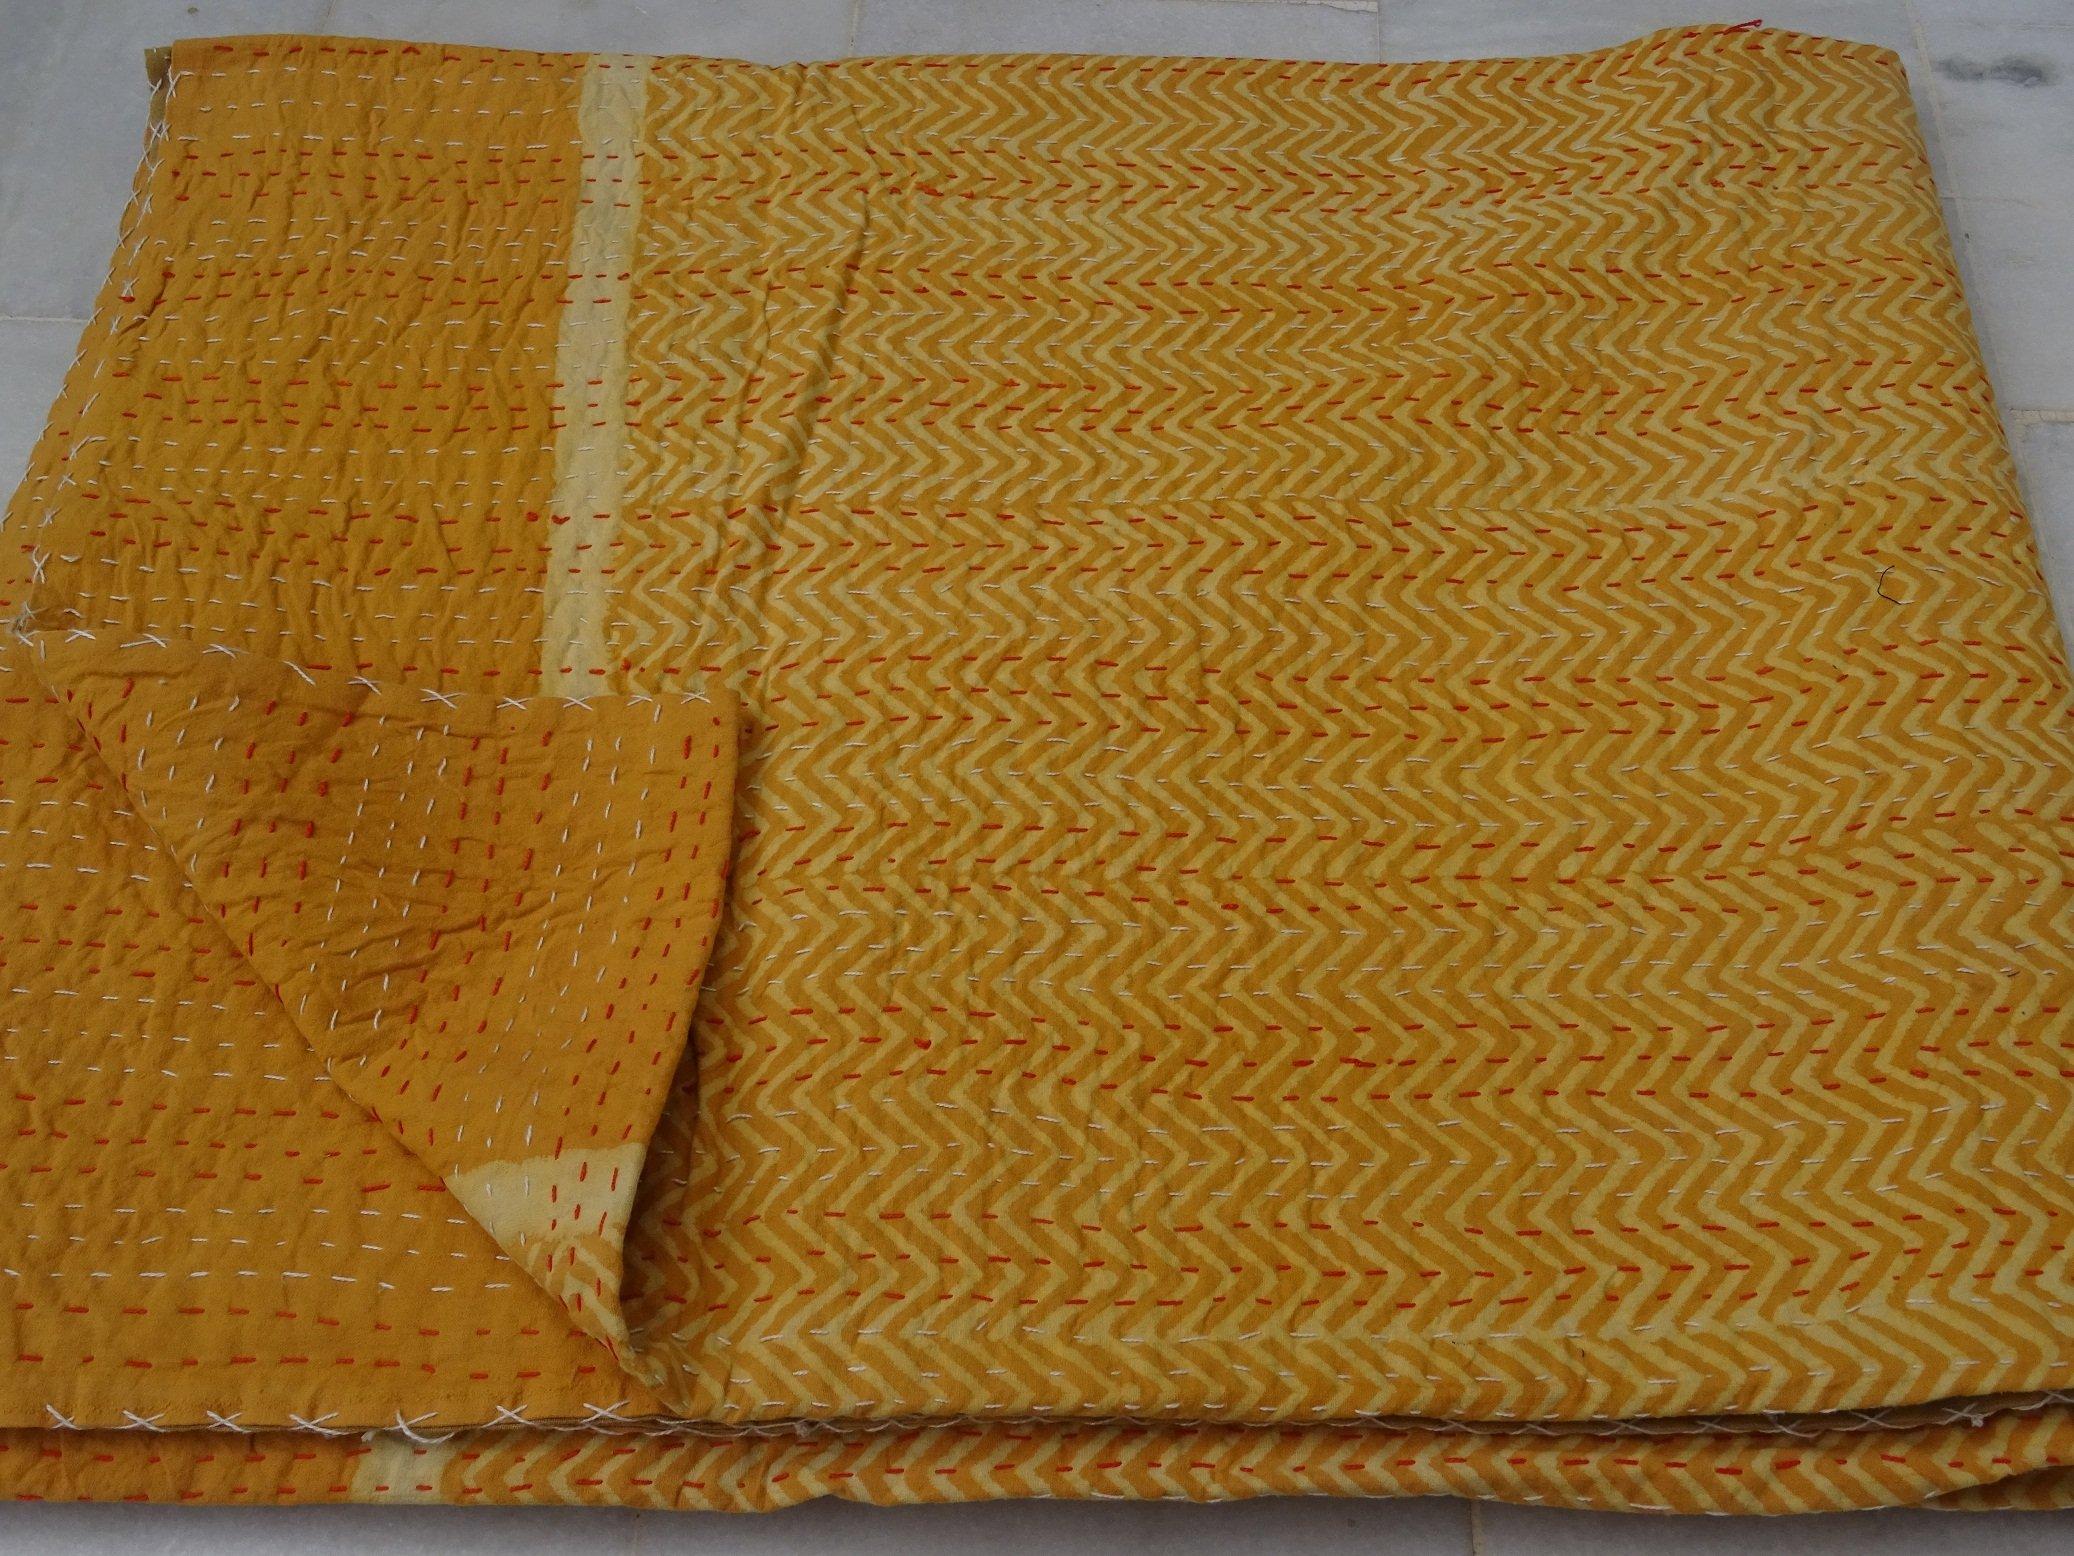 Tribal Asian Textiles Kantha Quilt Block Print Quilt Kantha Throw Blanket Queen Quilt Kantha Bedspread